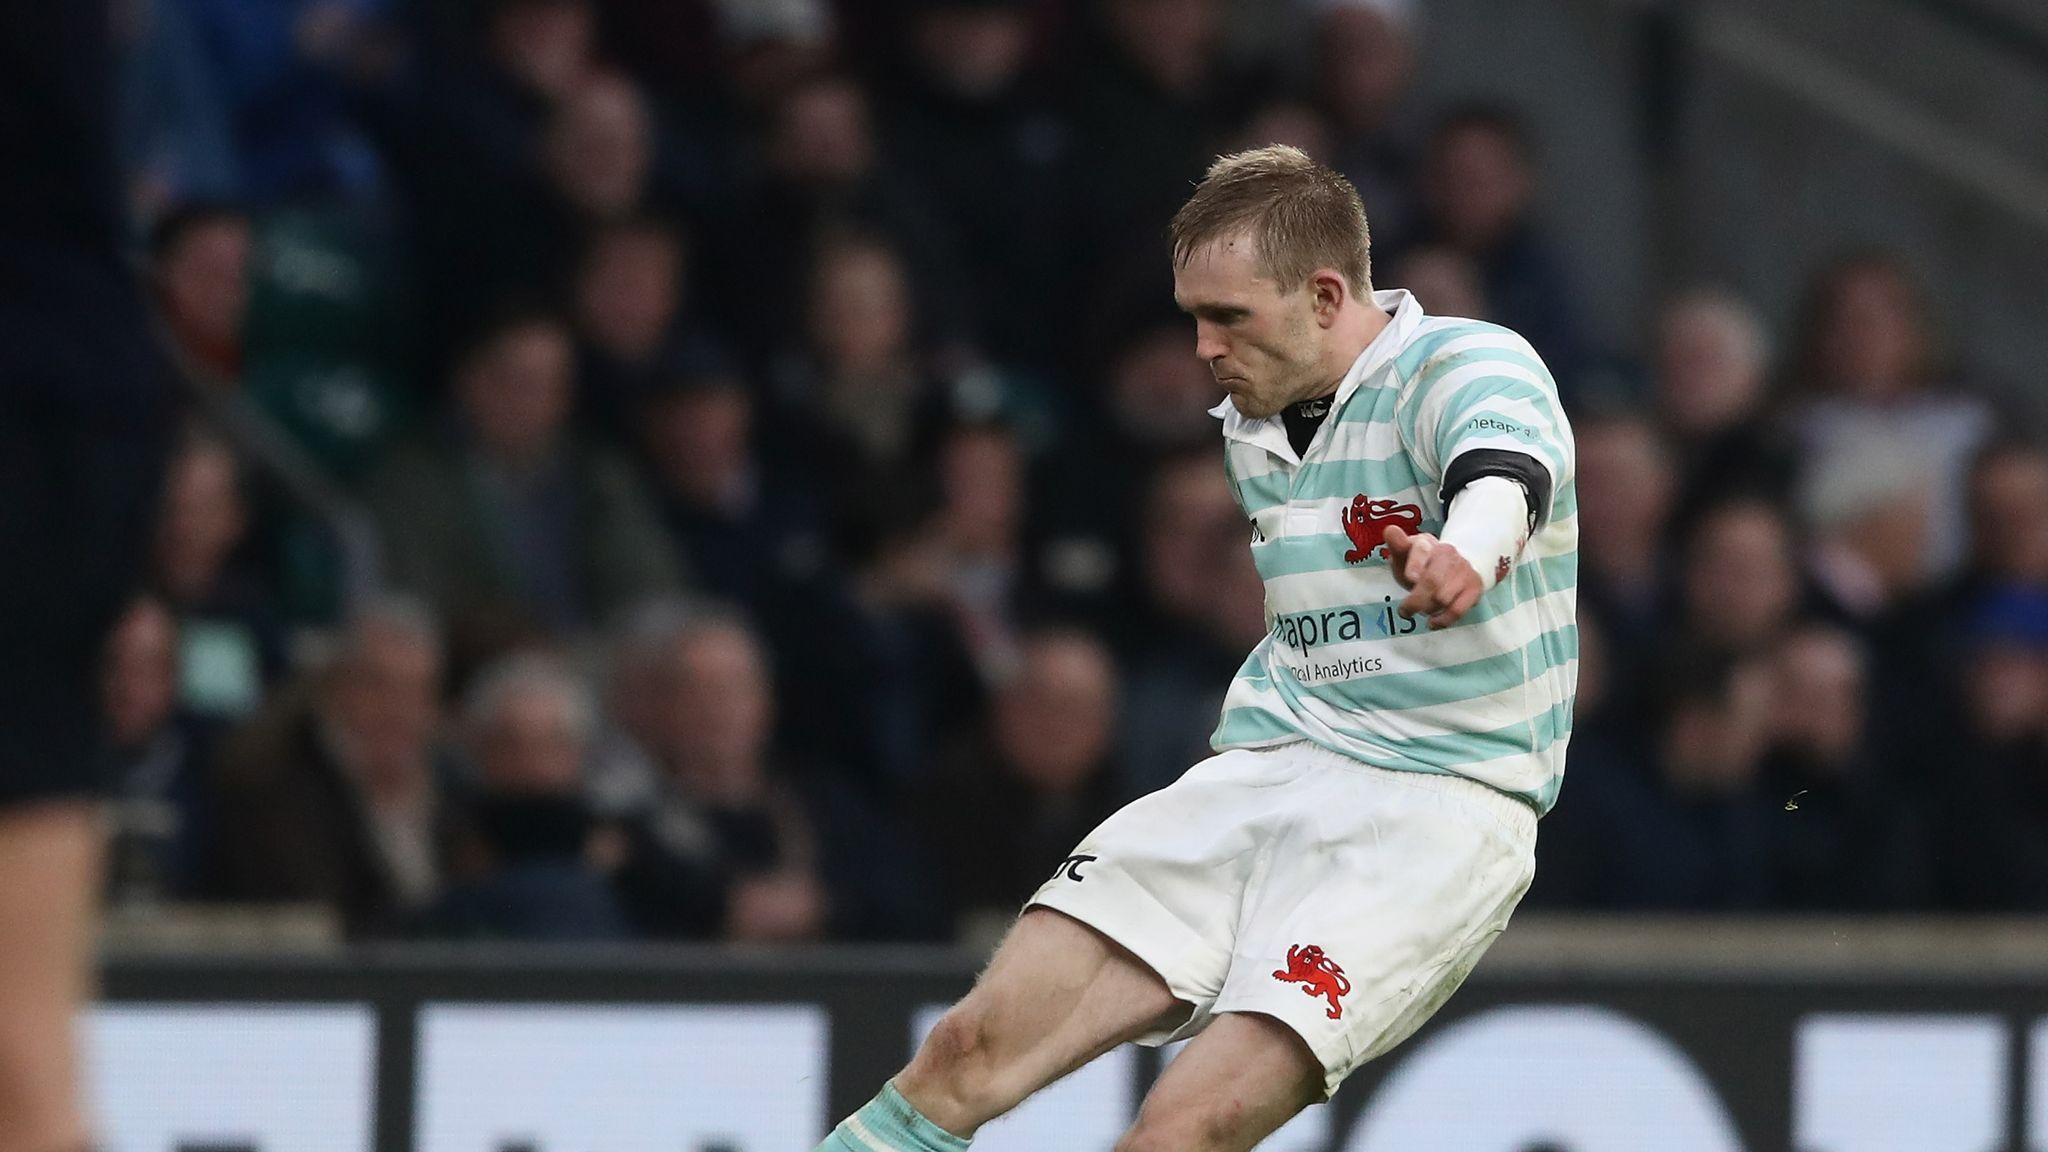 Oxford cambridge rugby betting odds wawrinka vs raonic betting expert soccer